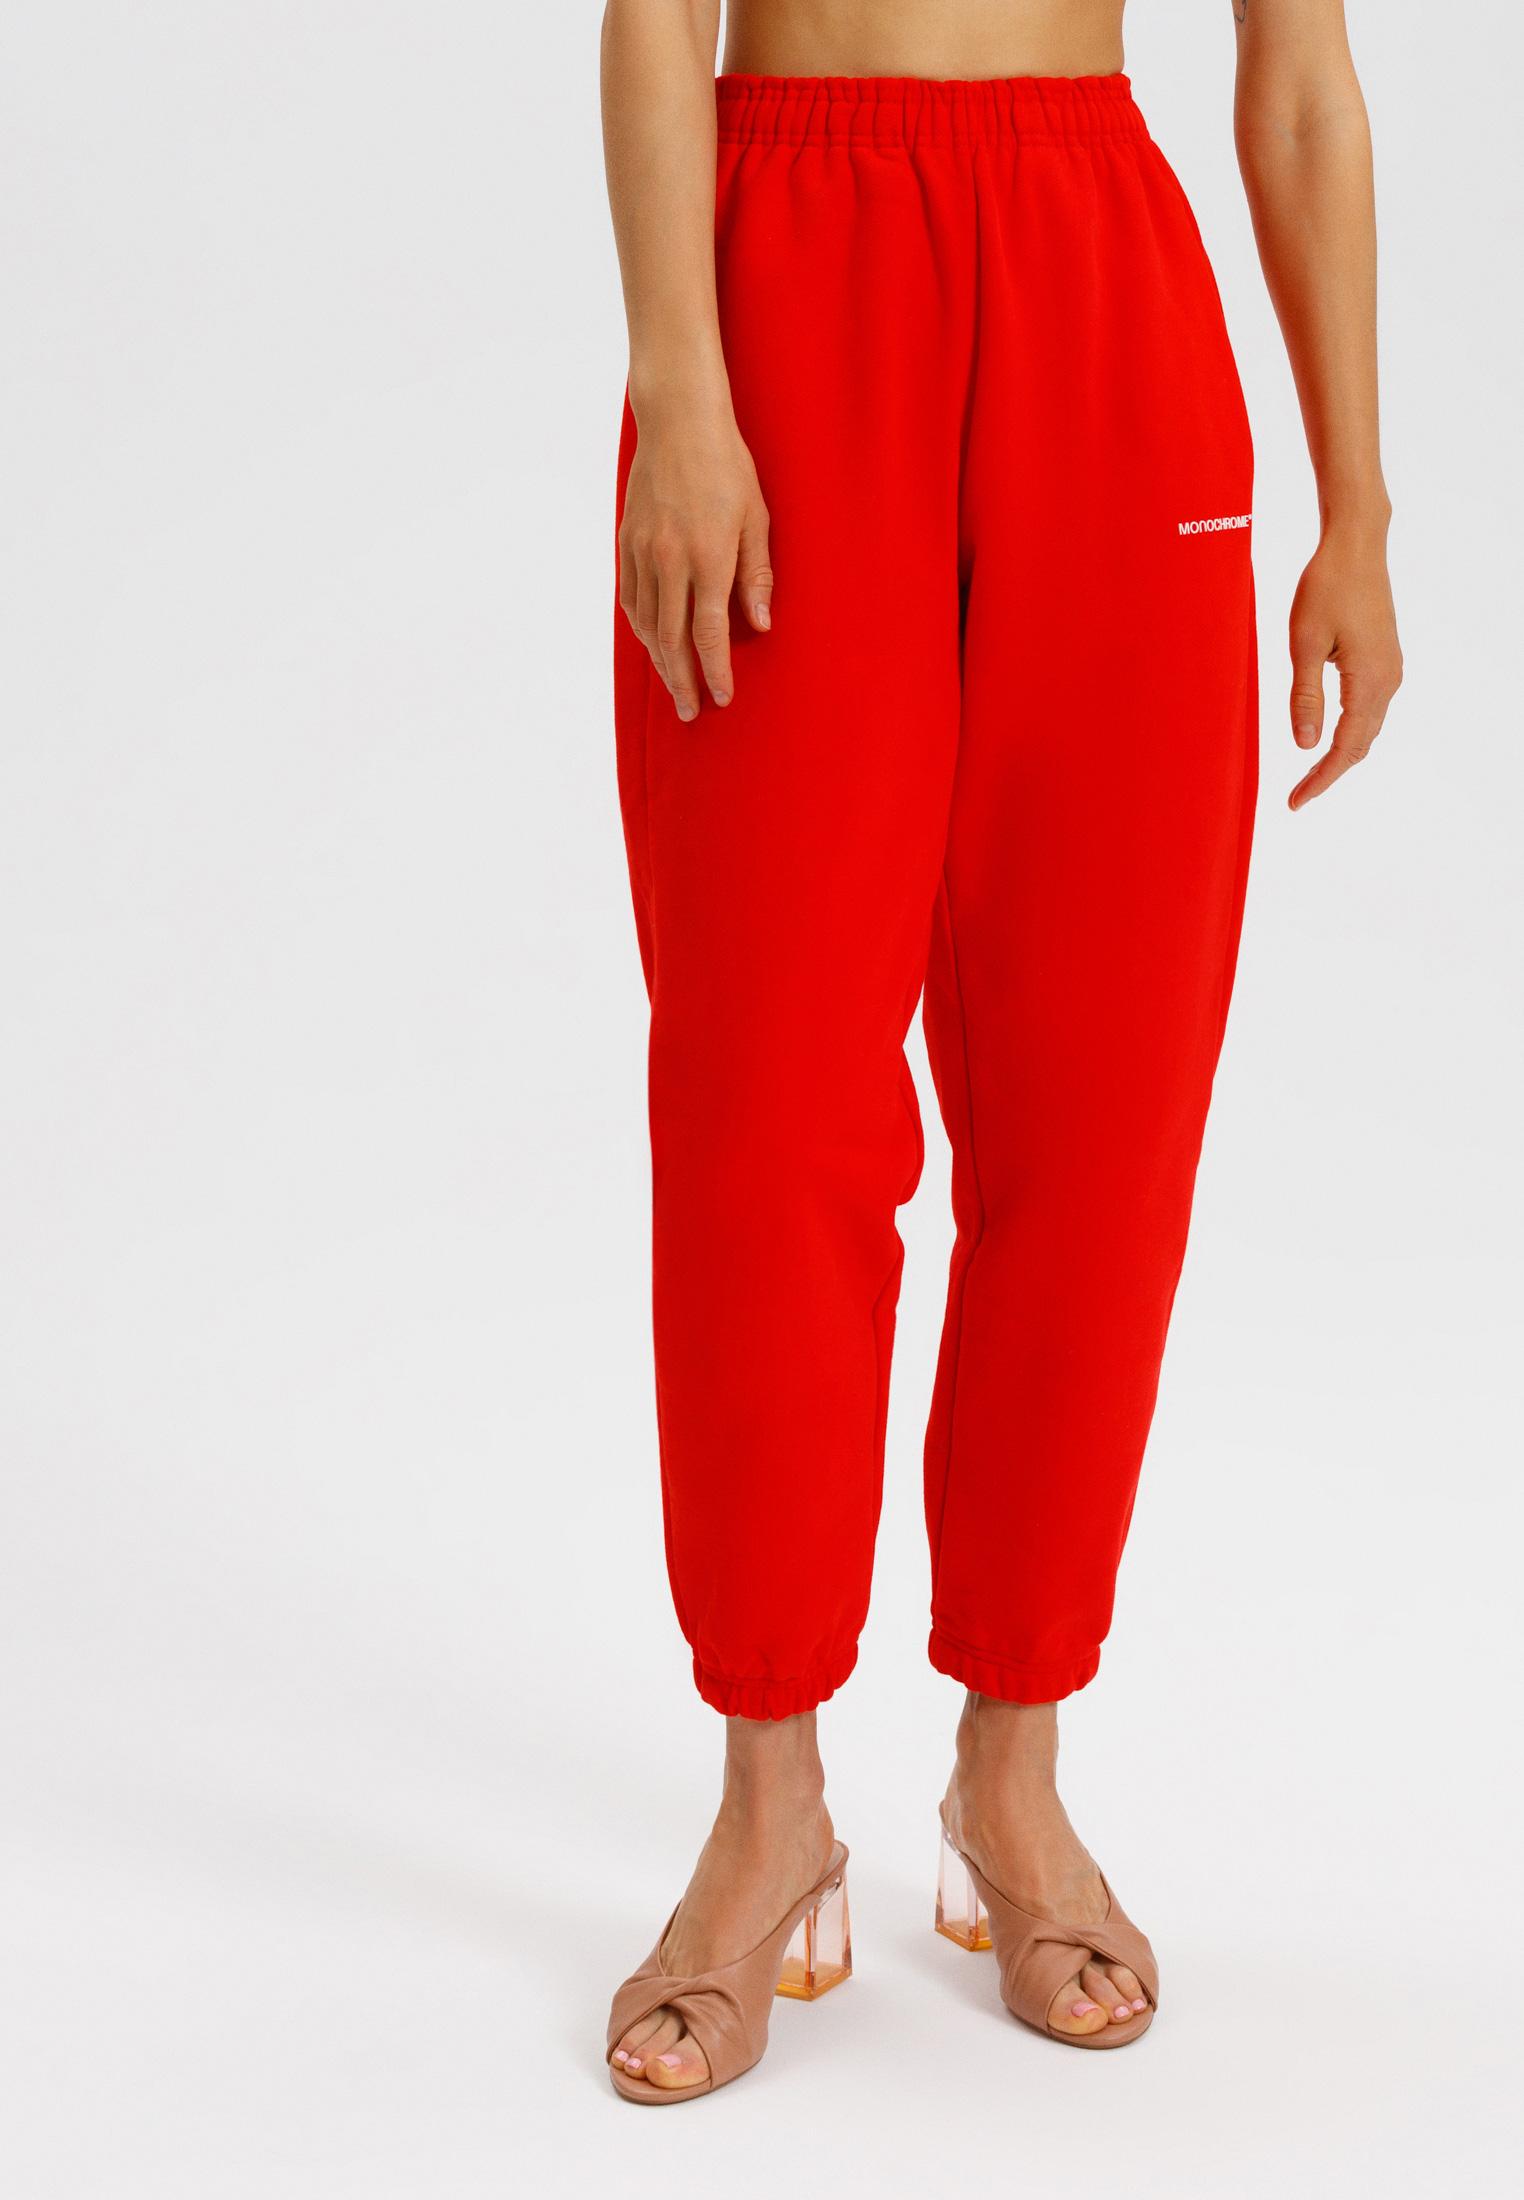 Женские спортивные брюки Monochrome M019-LUX-PNTS-LFE